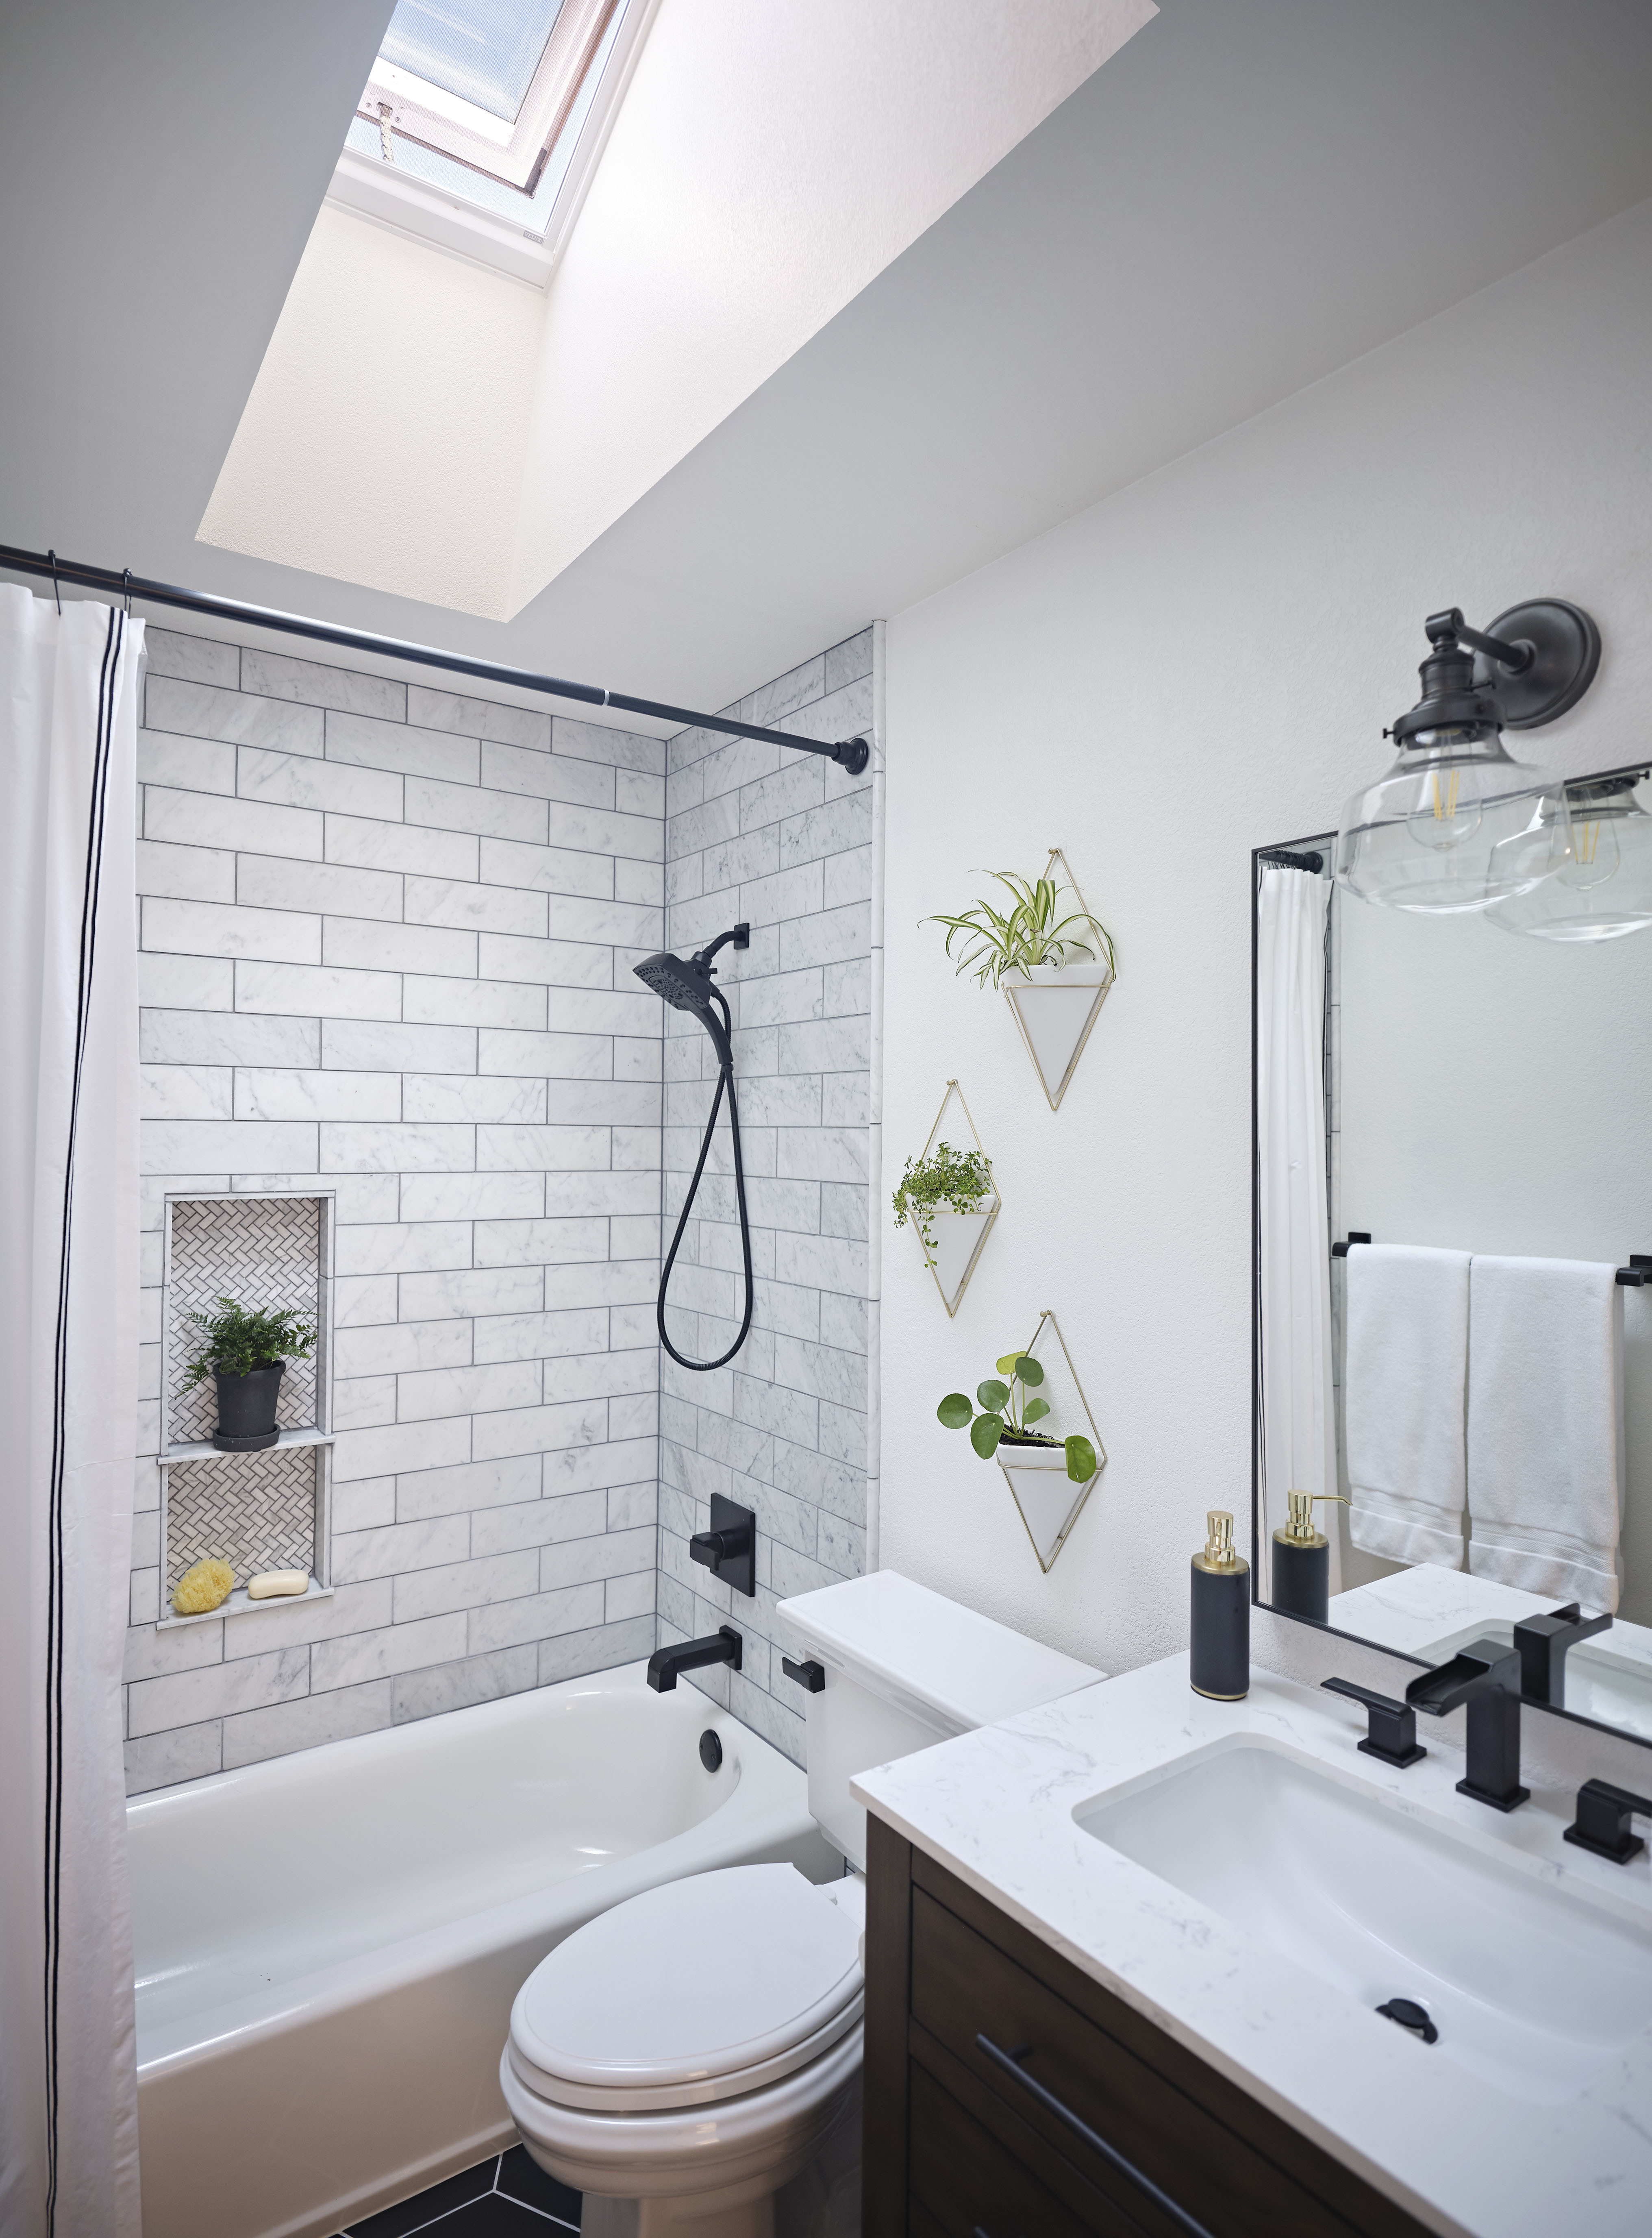 Small-bathroom-one-skylight.jpg#asset:5995